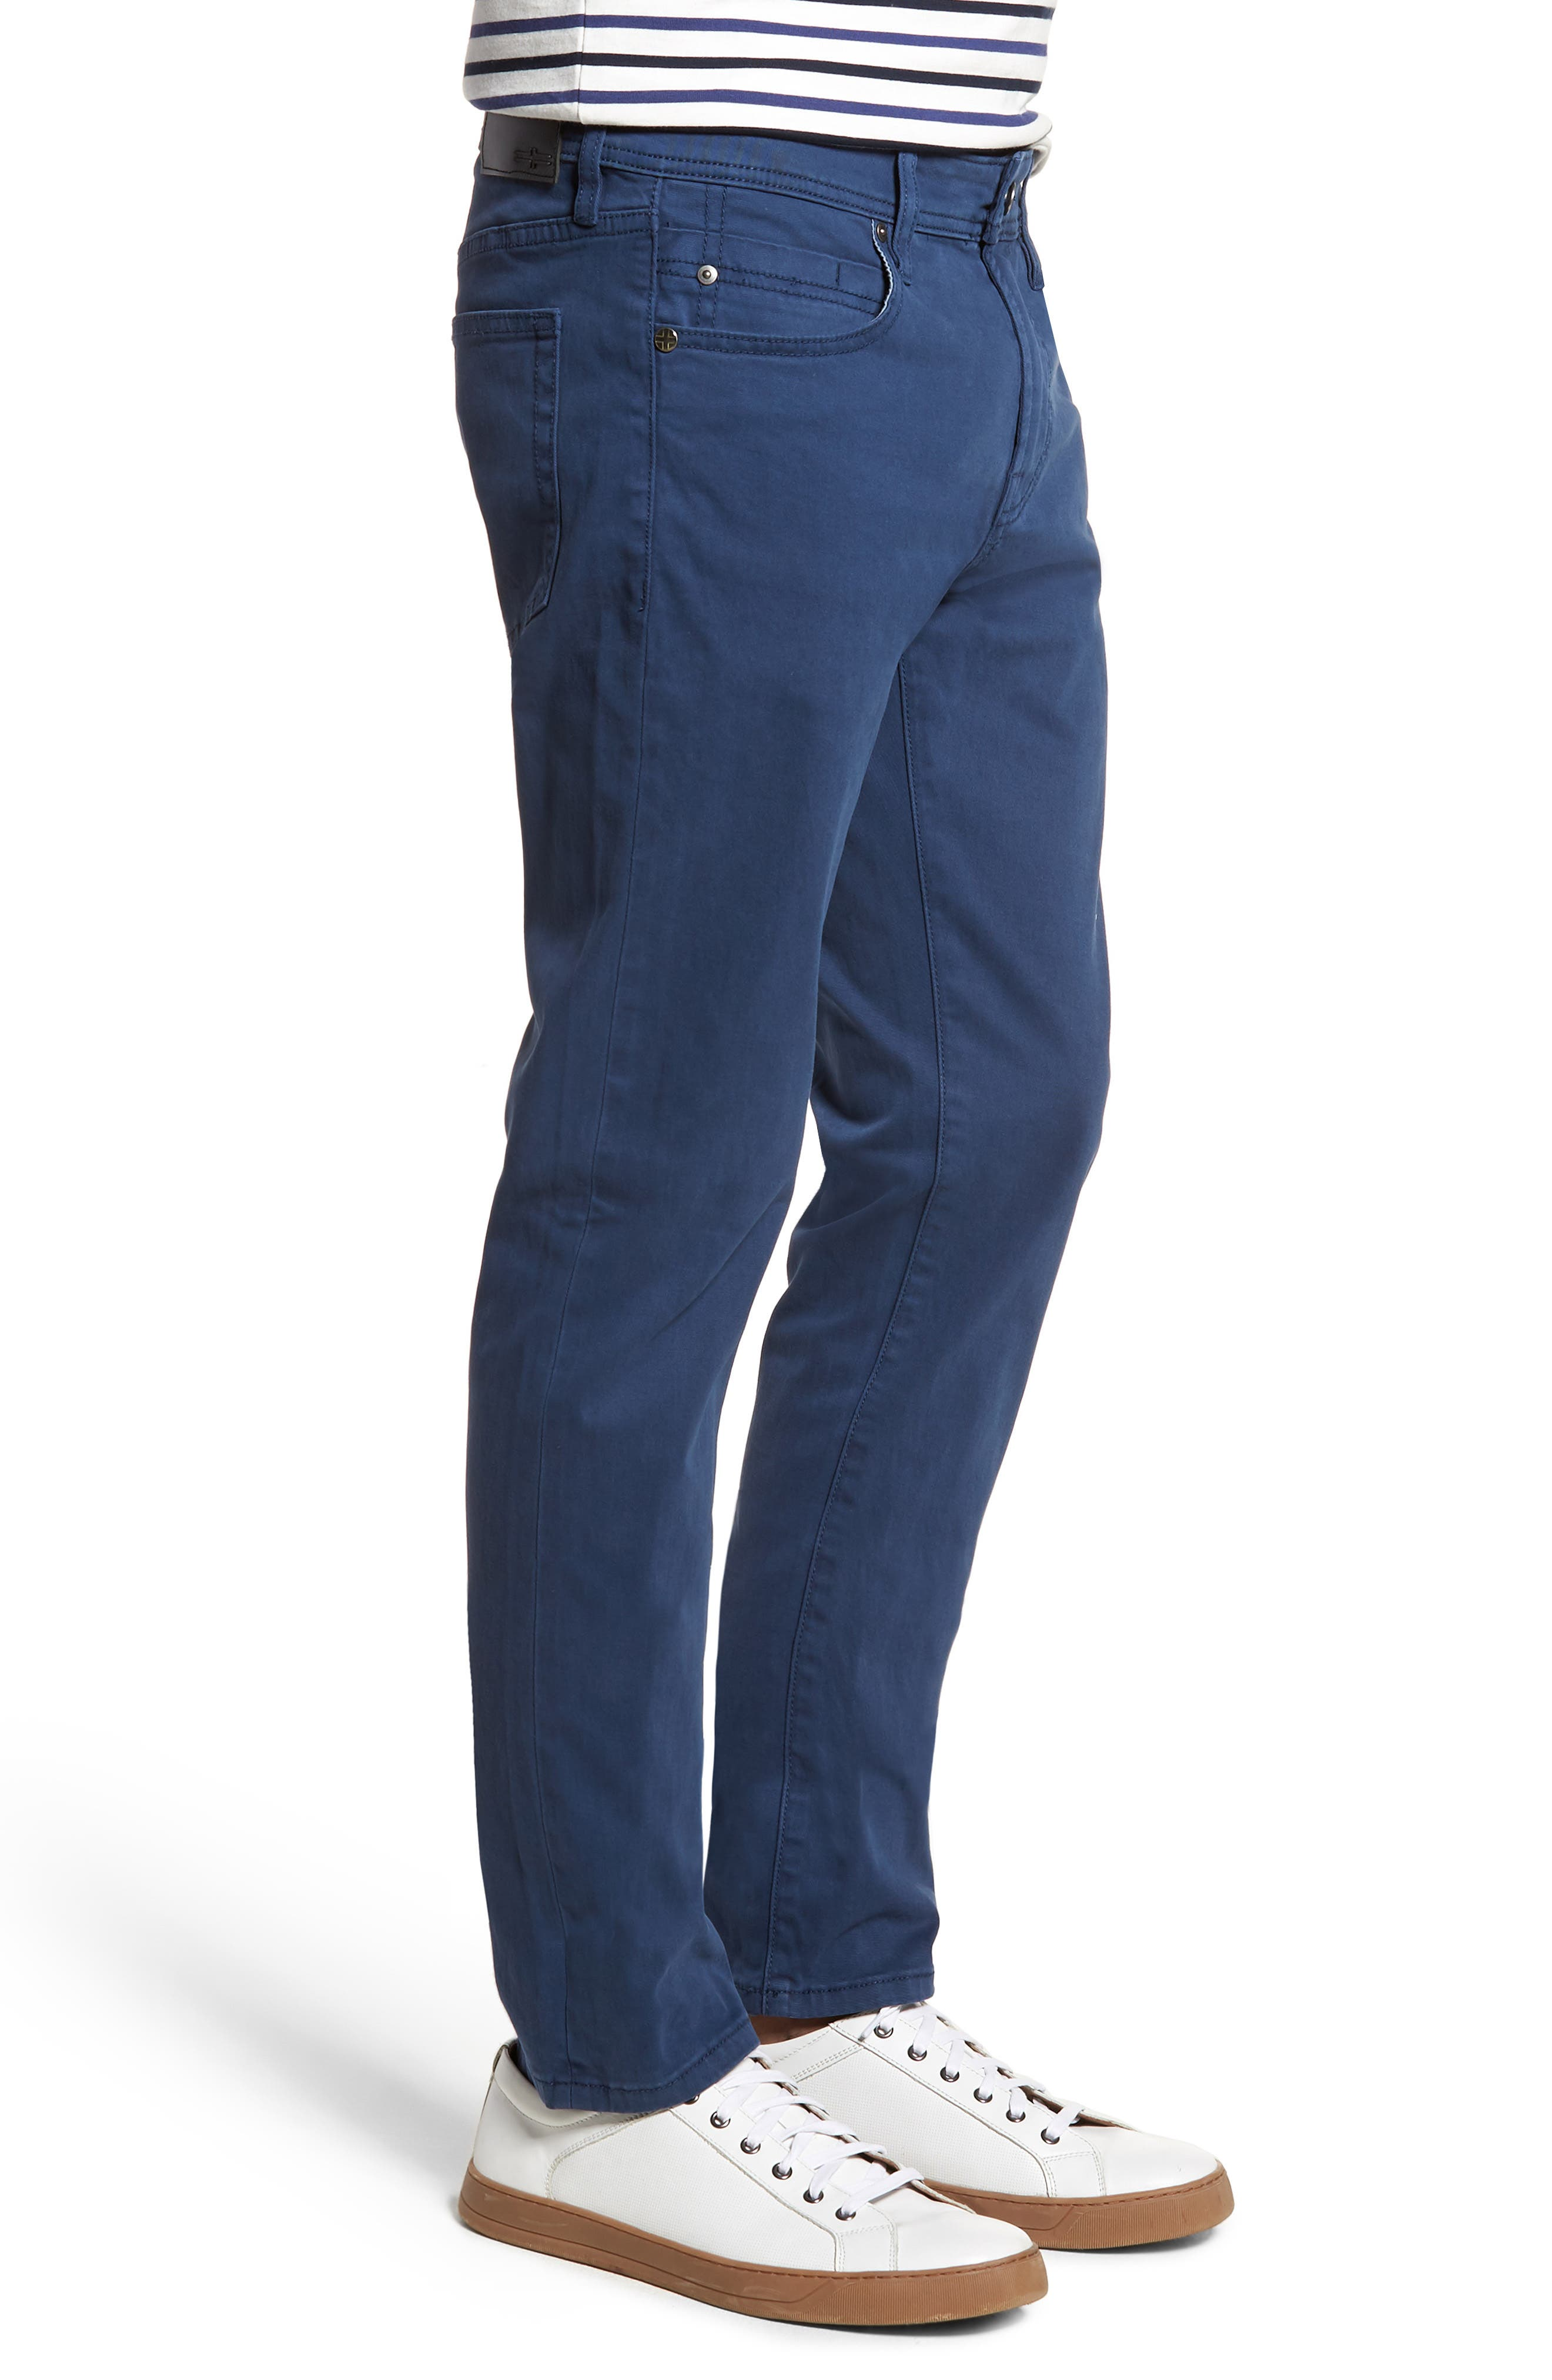 Alternate Image 3  - Liverpool Jeans Co. Kingston Slim Straight Leg Jeans (Blue Twilight)